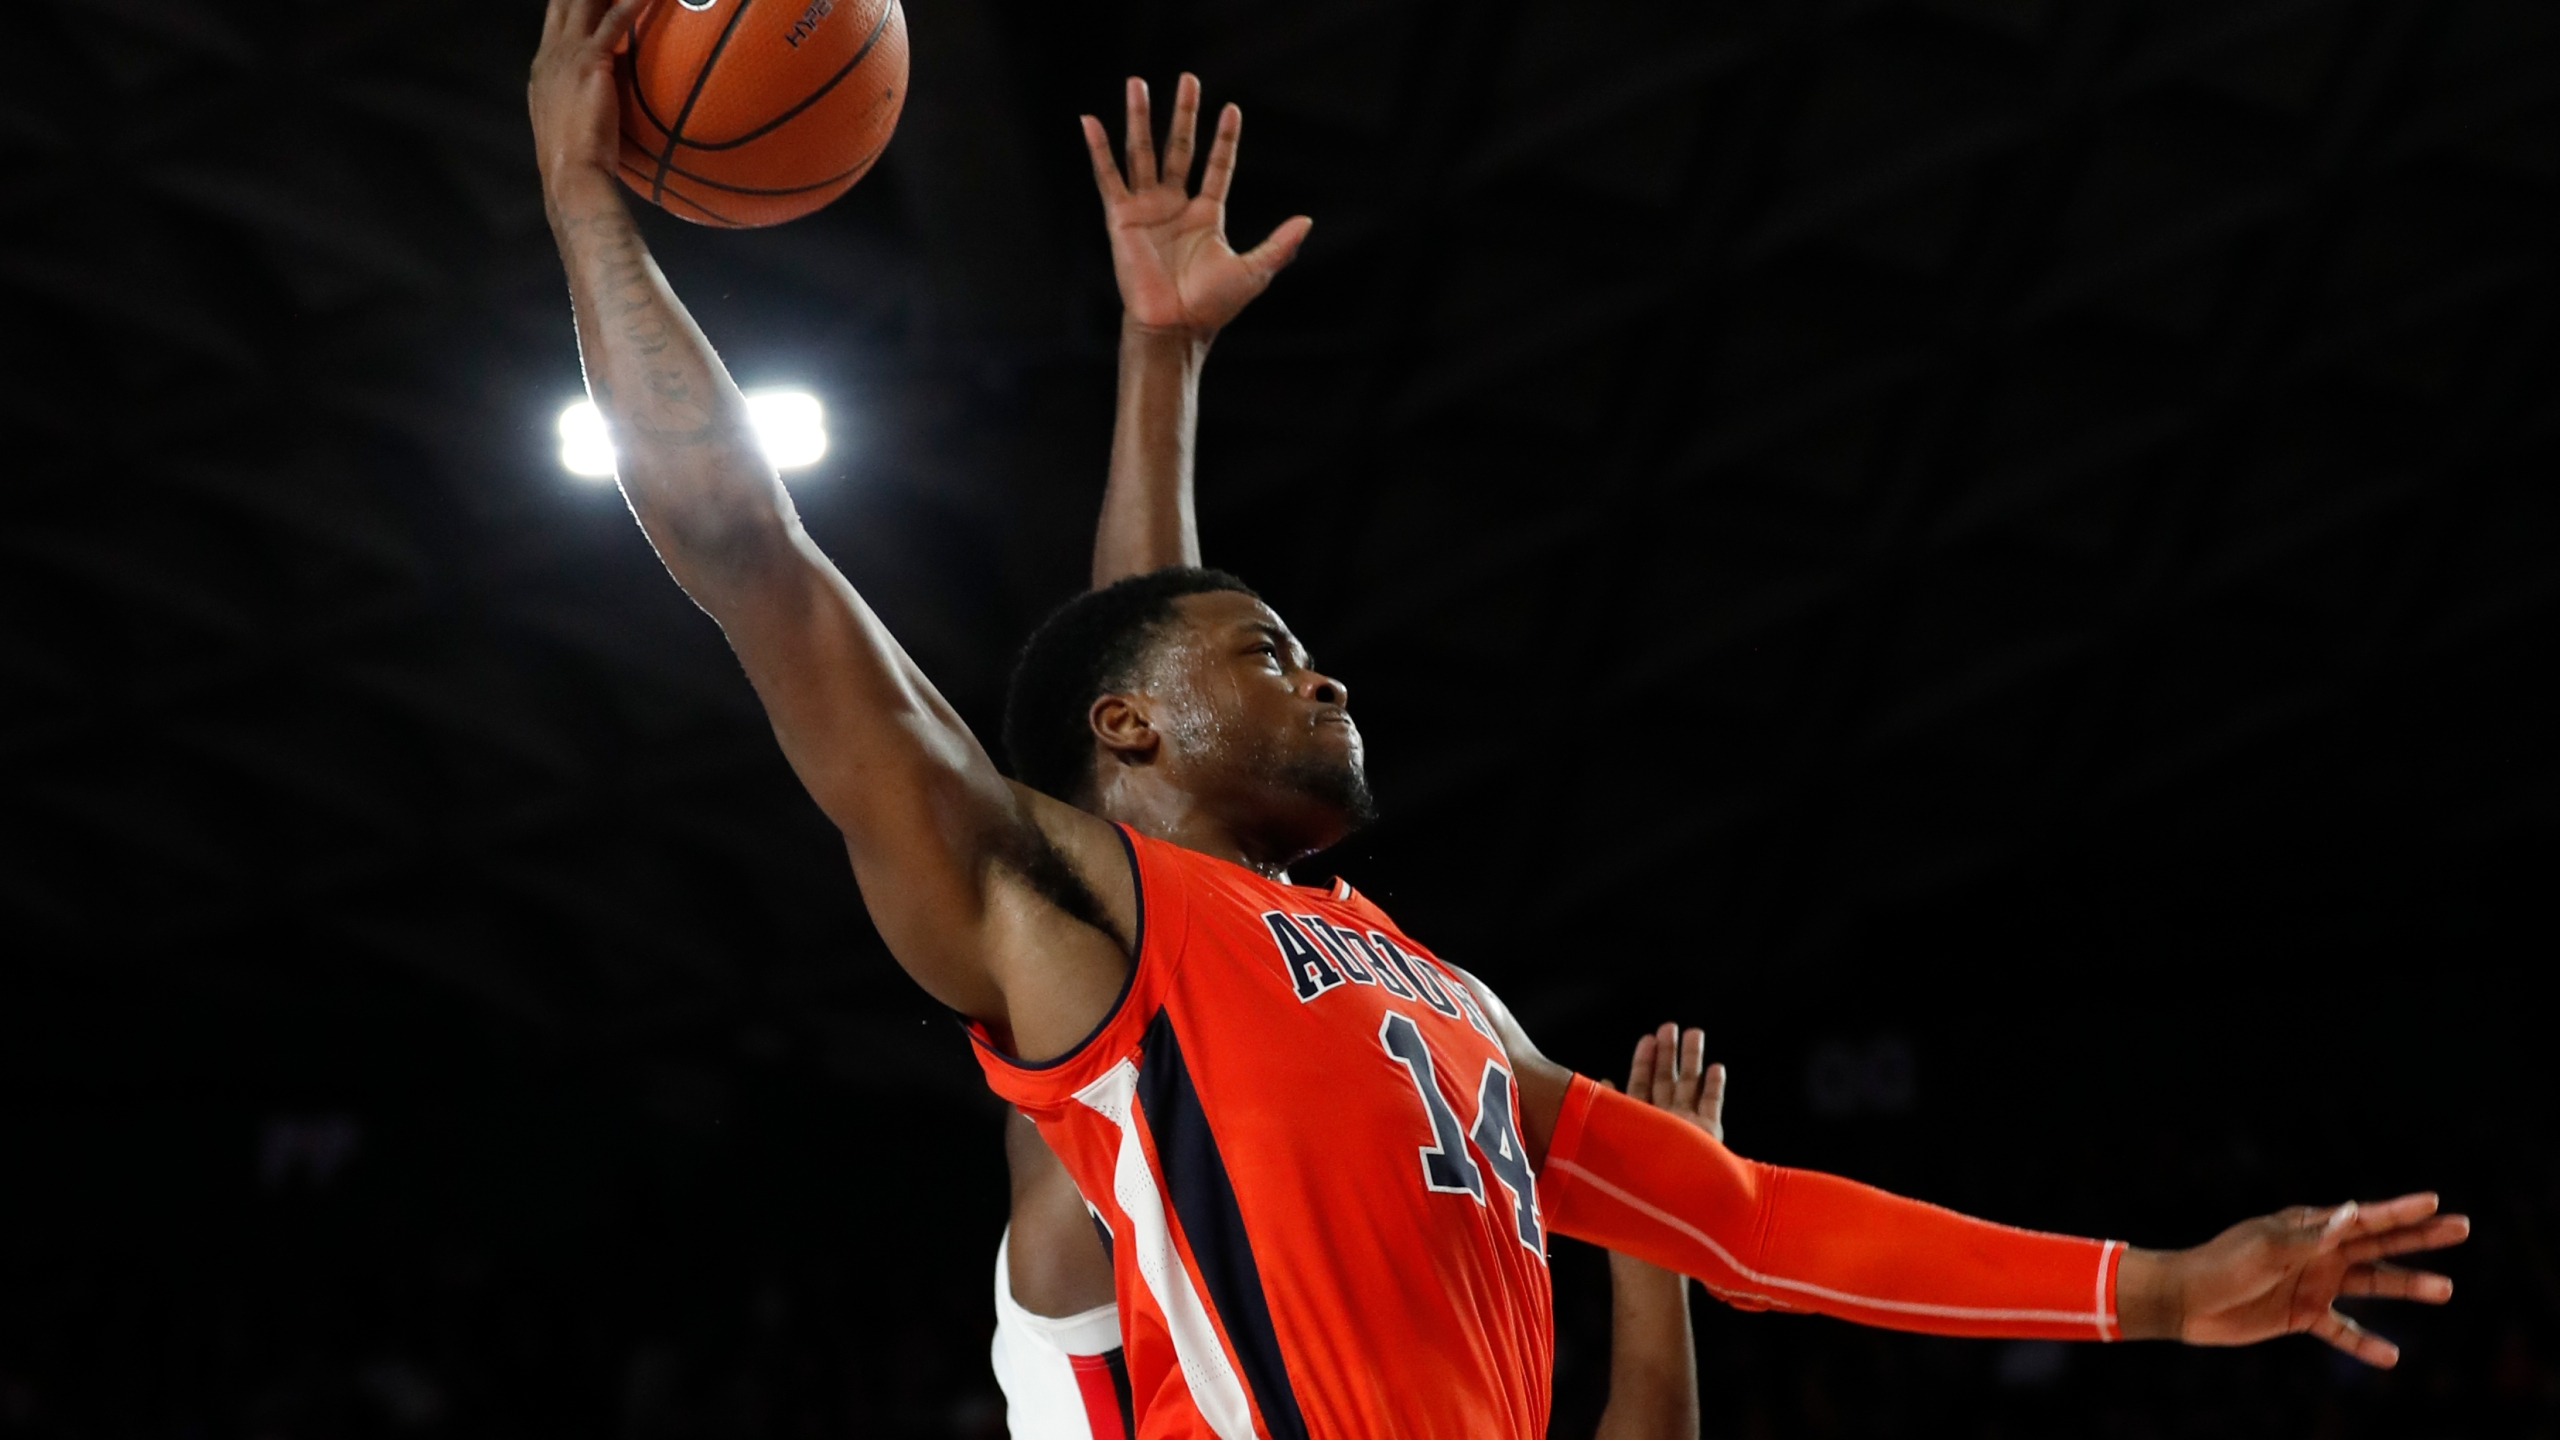 Auburn_Georgia_Basketball_29904-159532.jpg21719800